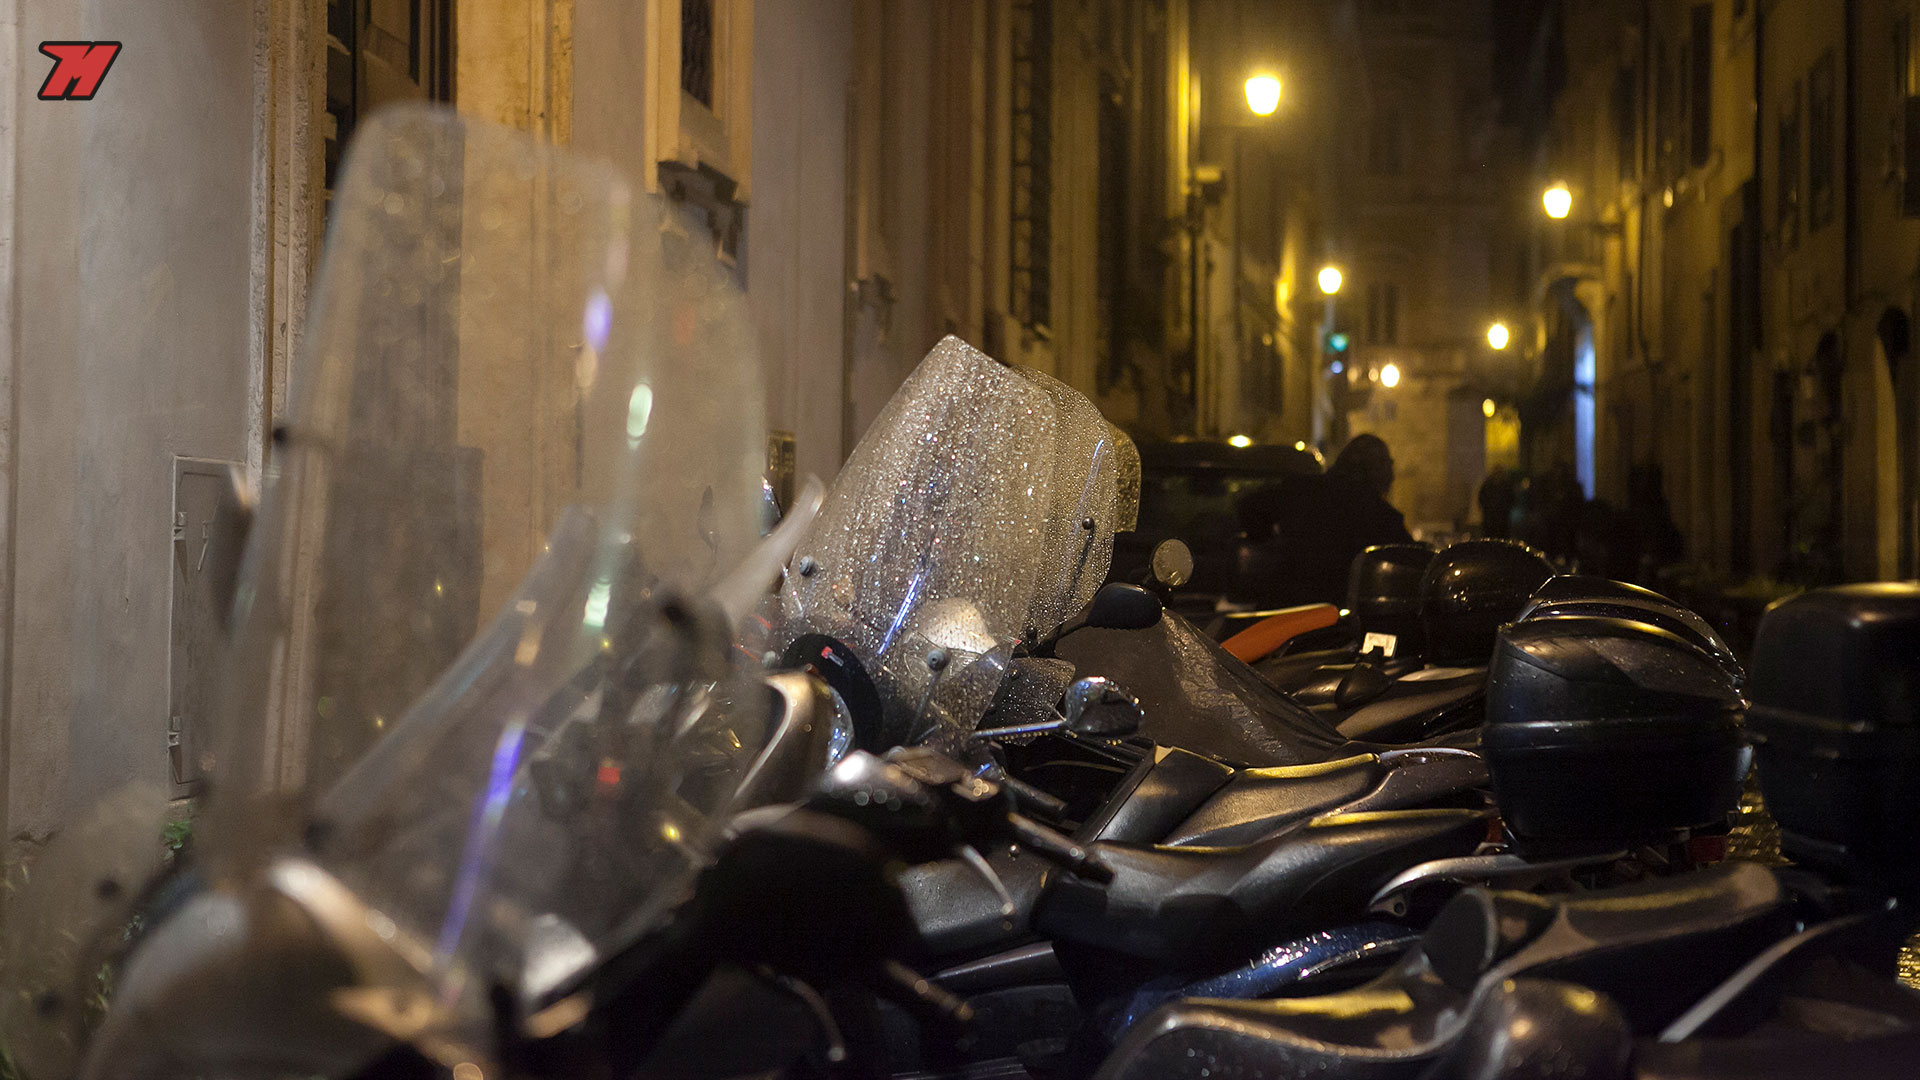 moto volée nuit